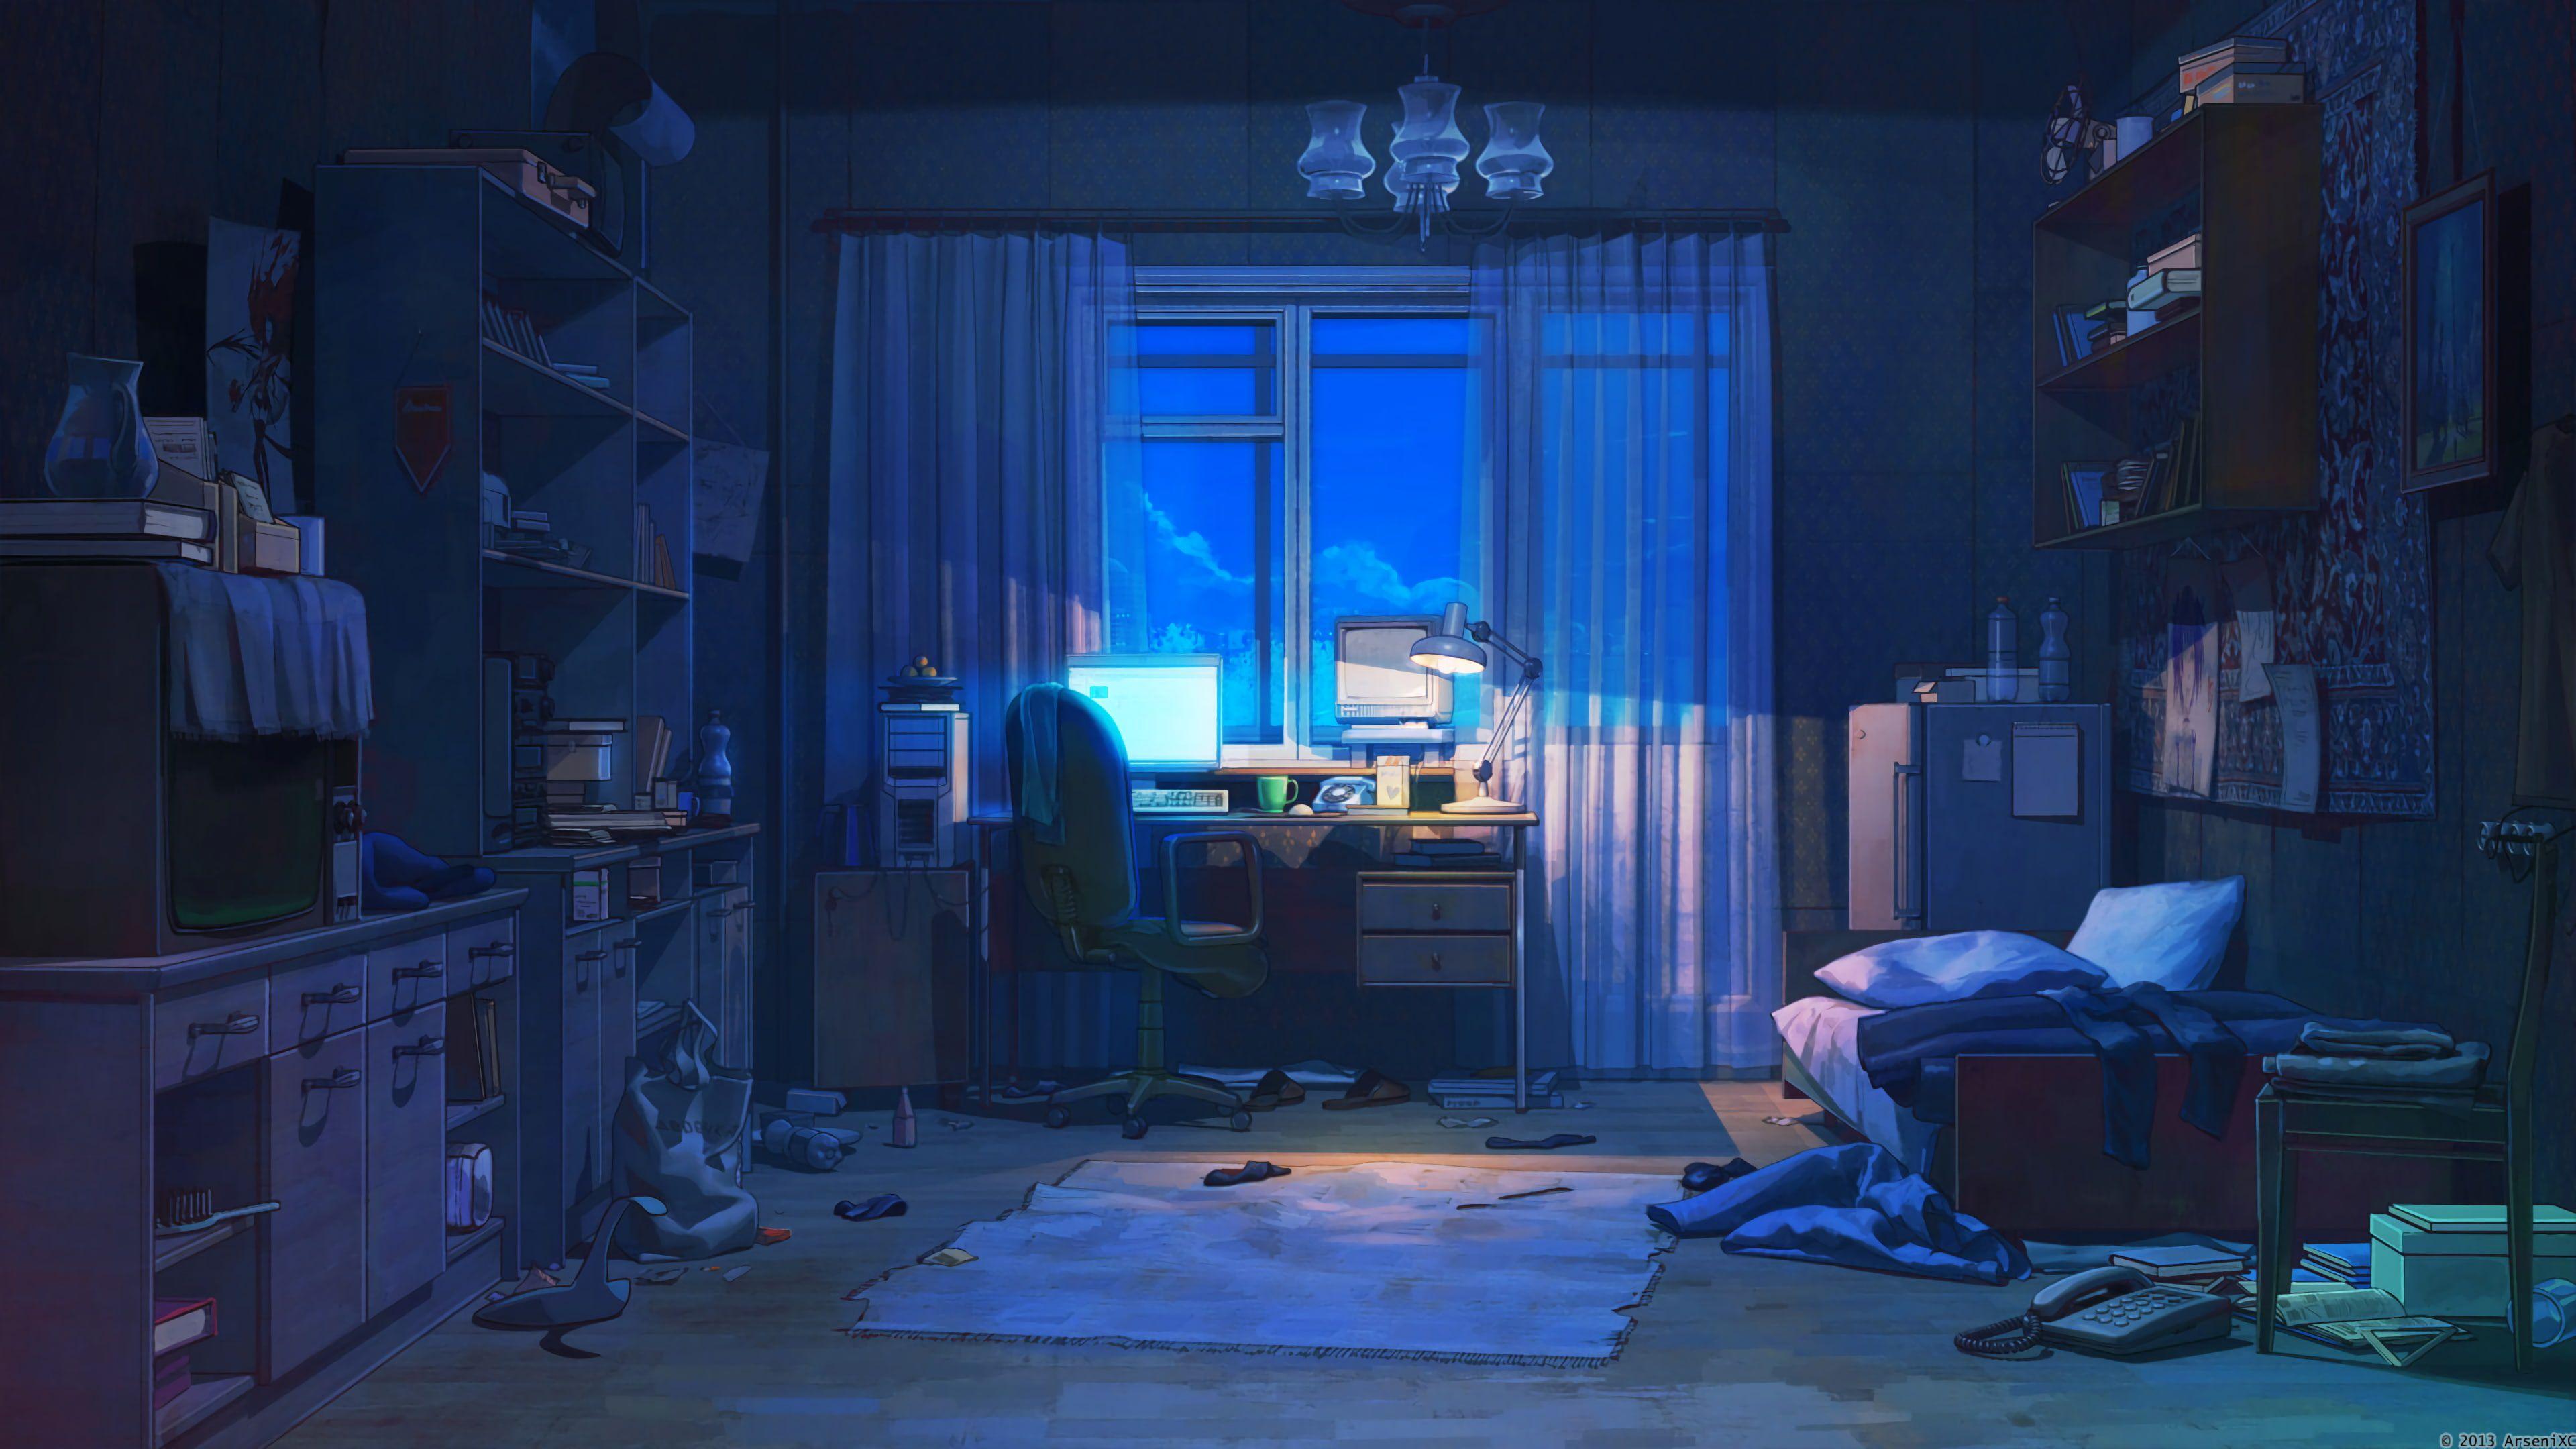 Anime Room Interior Dark Everlasting Summer Arseniy Chebynkin 4k Wallpaper Hdwallpaper Desktop Anime Scenery Scenery Background Anime Wallpaper